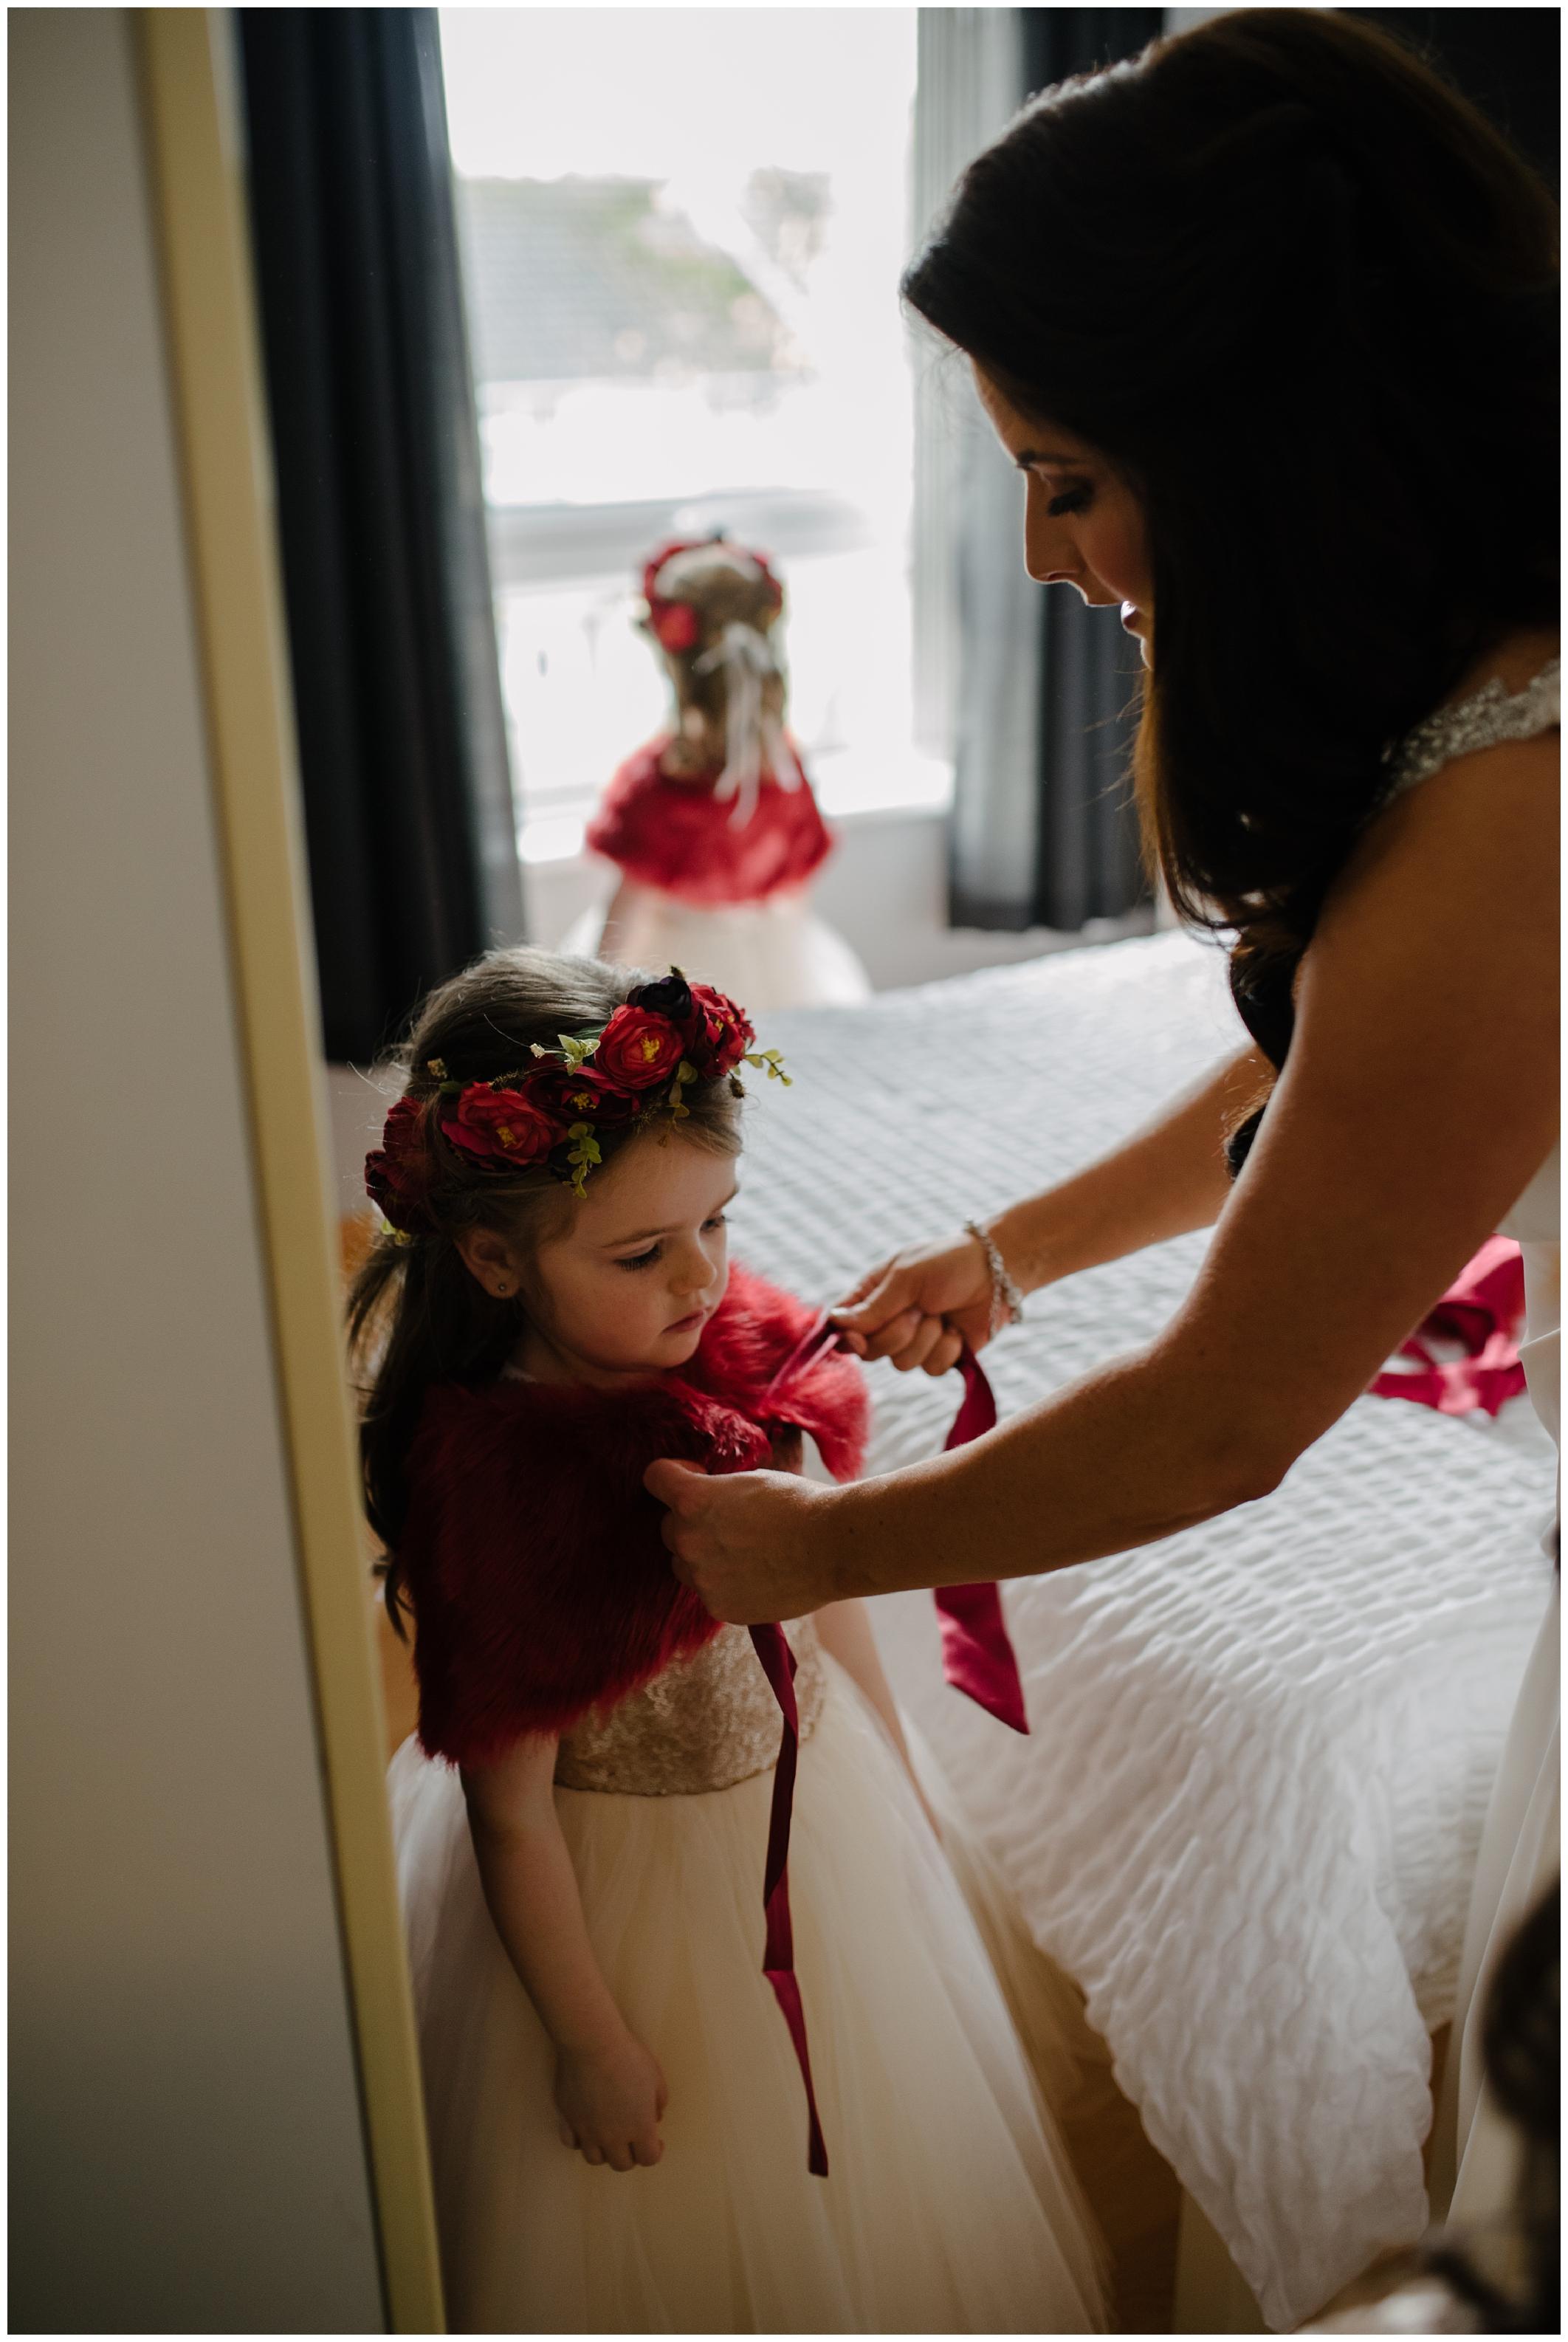 tracey_conor__wedding_jude_browne_photography_0012.jpg